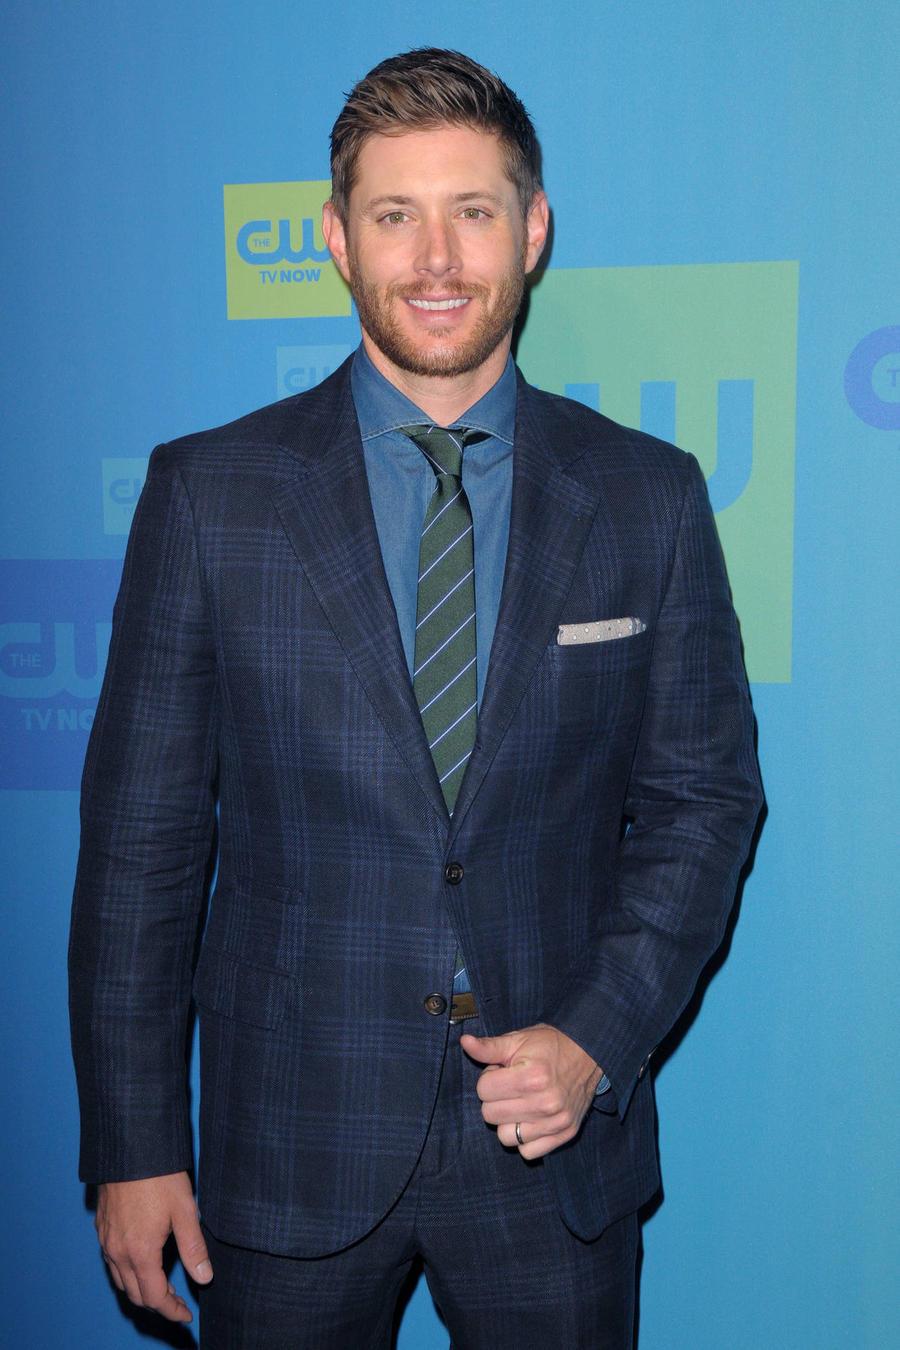 Jensen Ackles At The Supernatural PaleyFest 2011held At